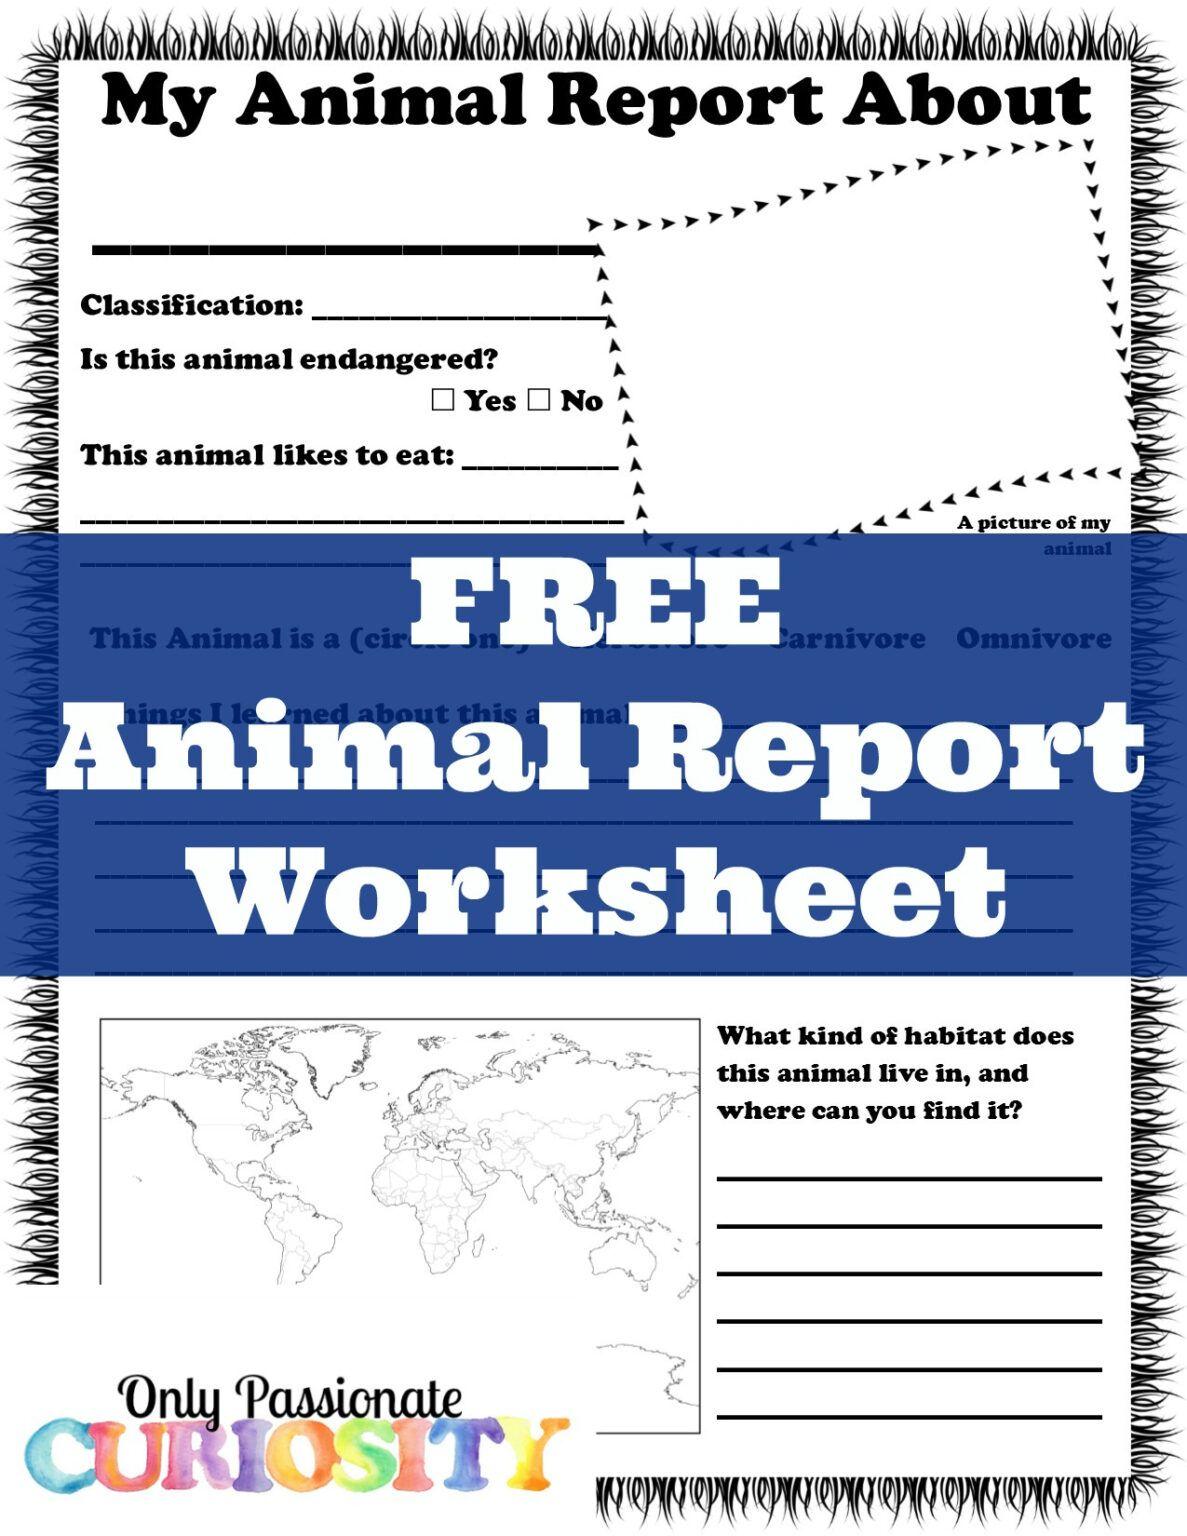 Animal Report Worksheet